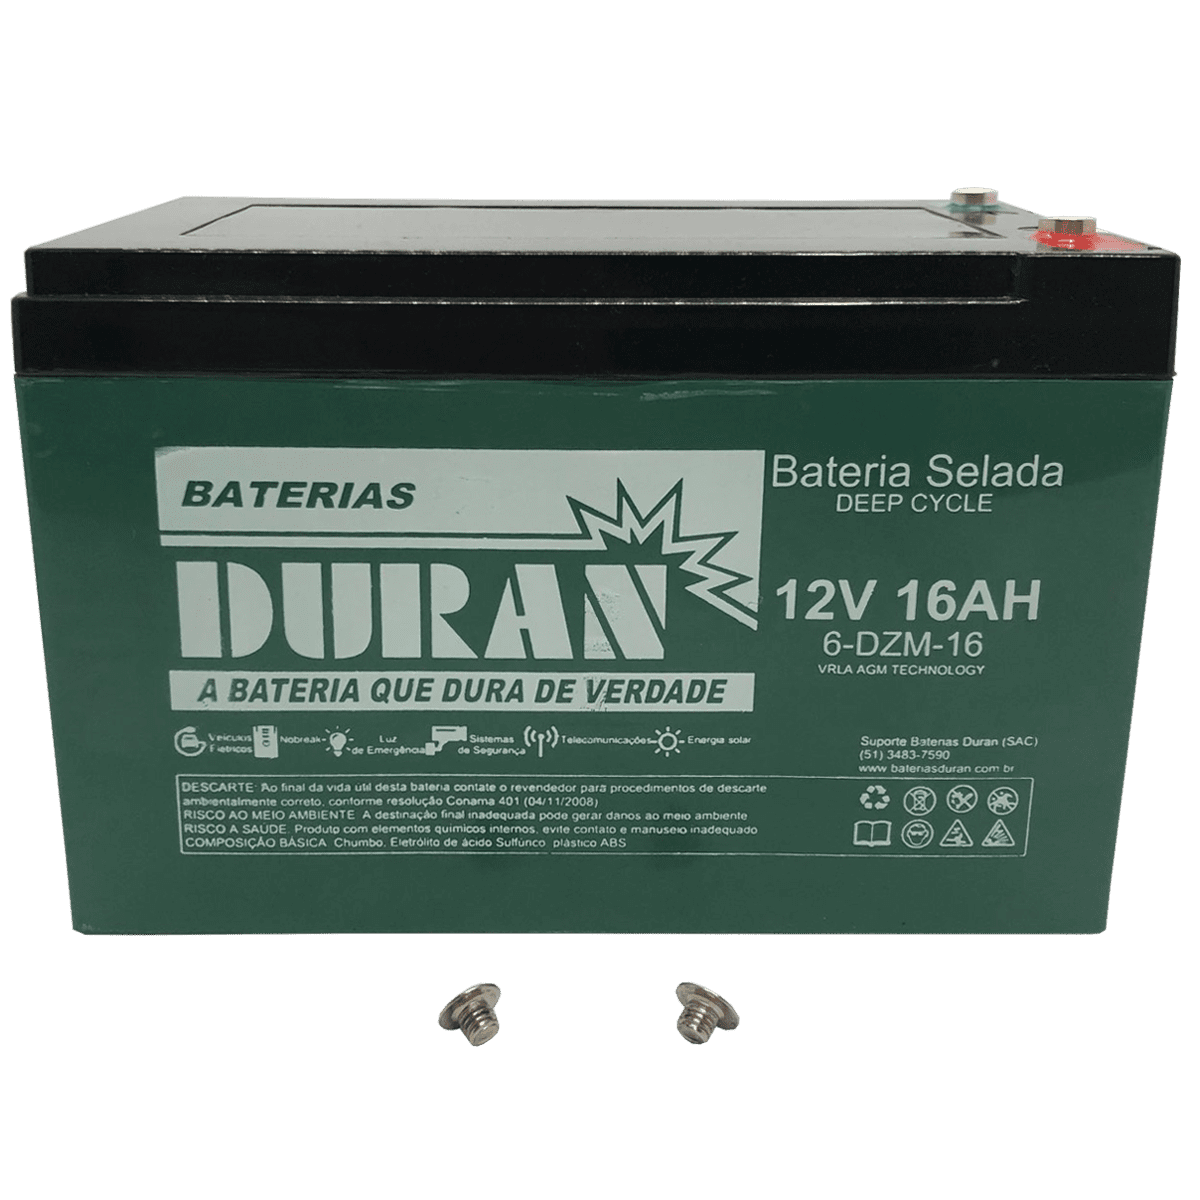 Kit 5 Baterias Selada Gel Ciclo Profundo Duran 16ah 12v 6-dzm-12